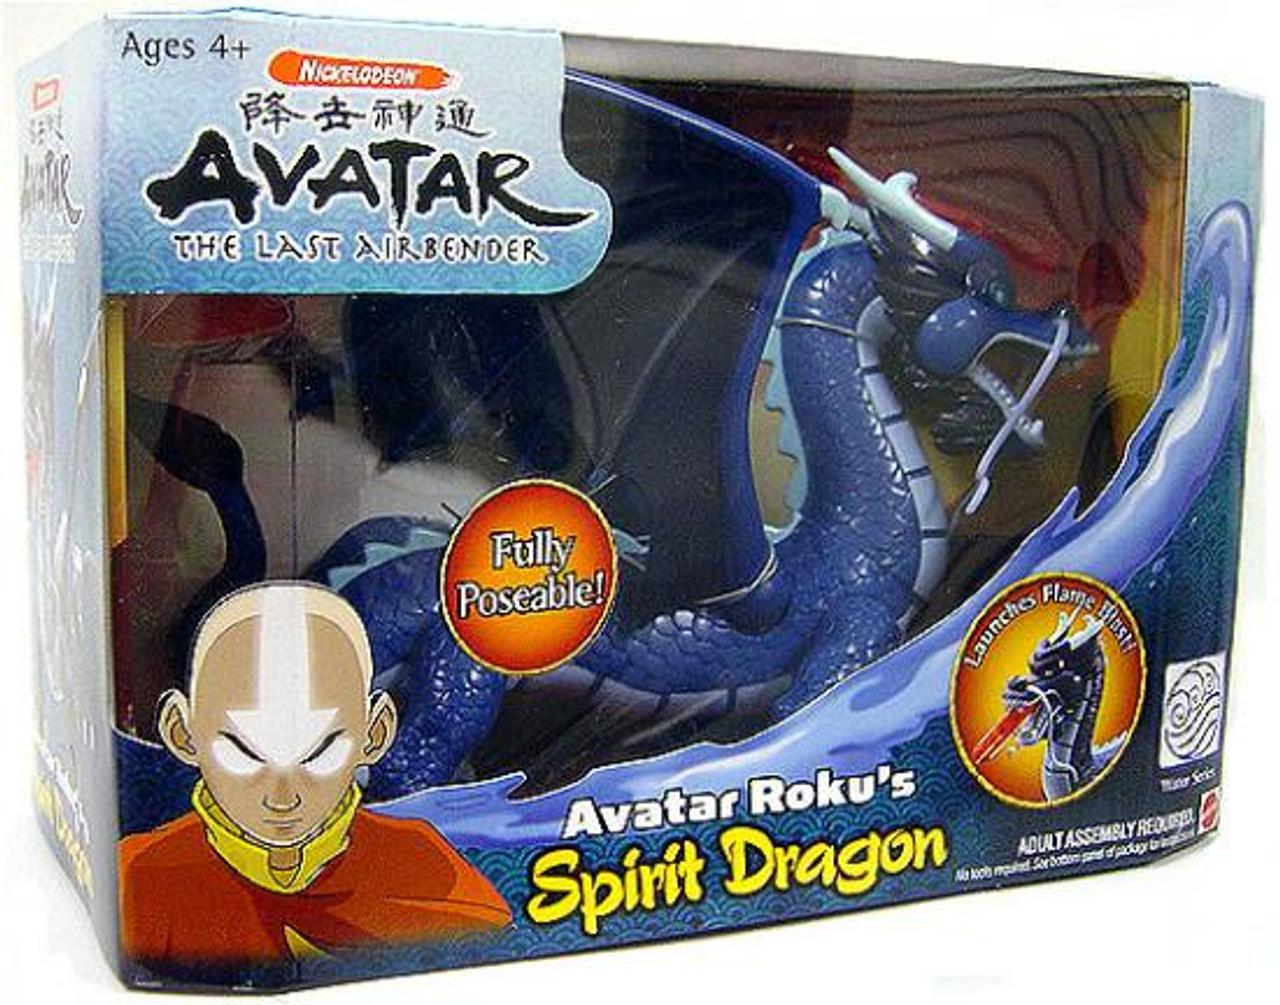 Avatar the Last Airbender Avatar Roku's Spirit Dragon Action Figure